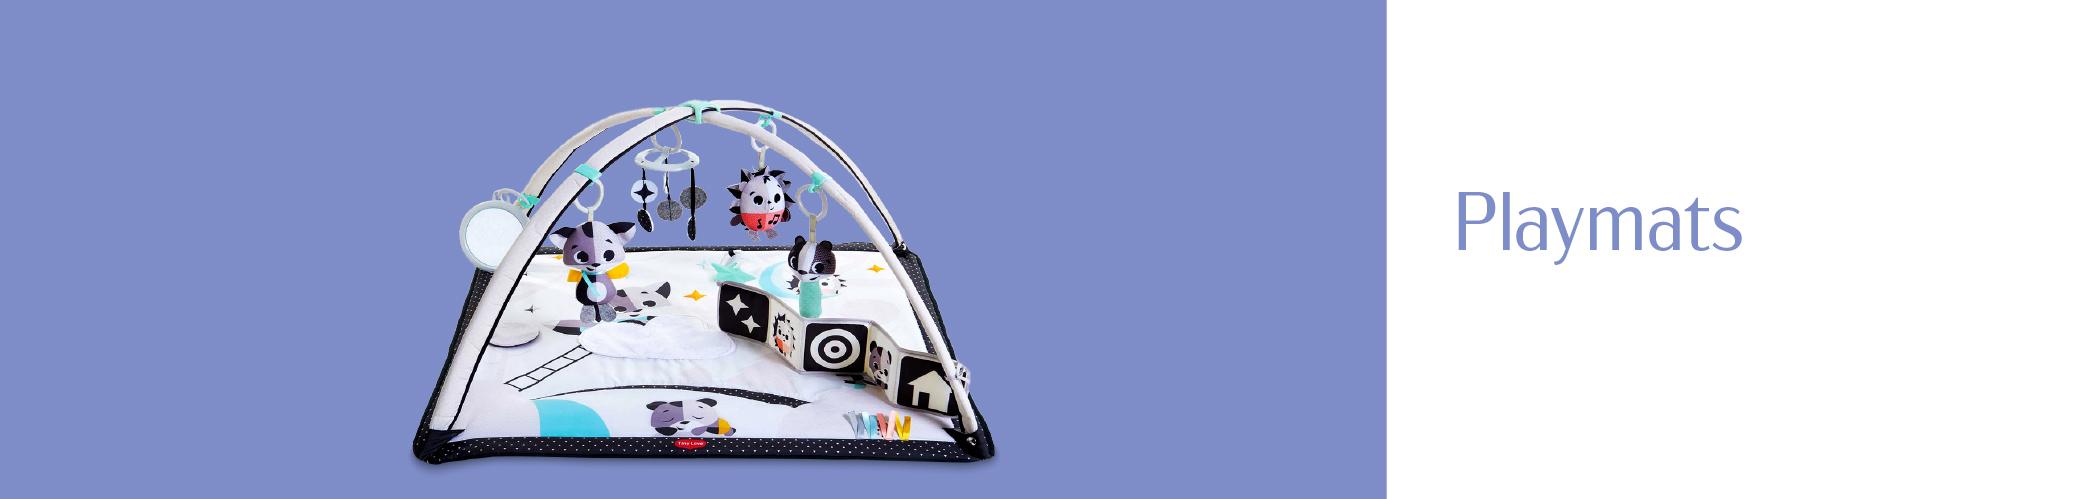 -50-playmats-internalbanner-may21.jpg